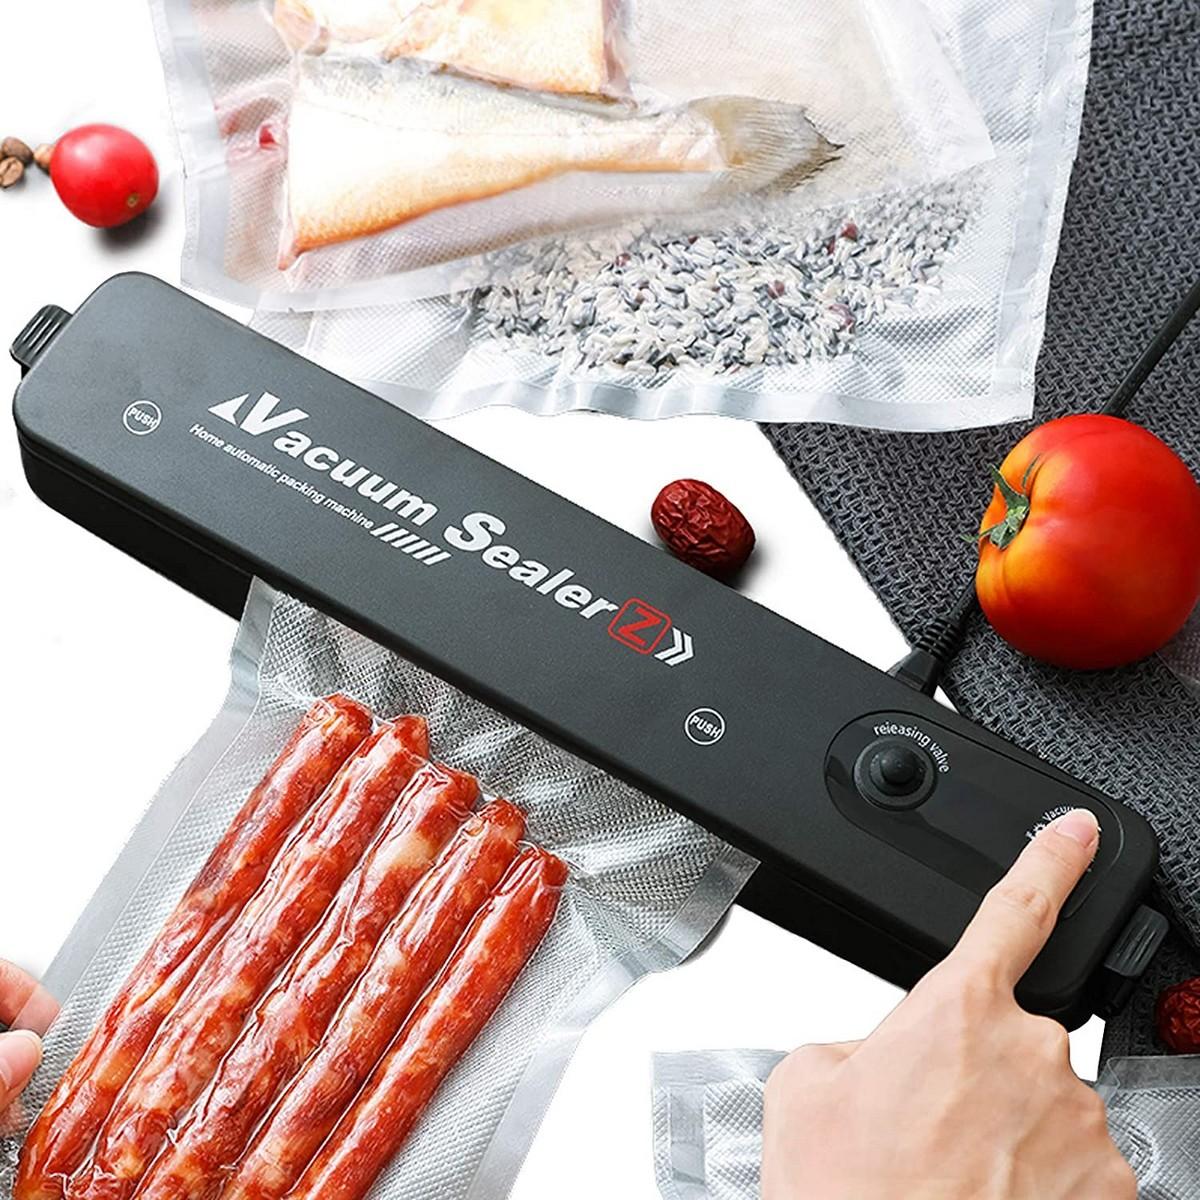 Vacuum Sealer Hand Machine Automatic Food Sealer for Food Saver 5 Vacuum Bags Kitchen Tools Set - ZKFK-001